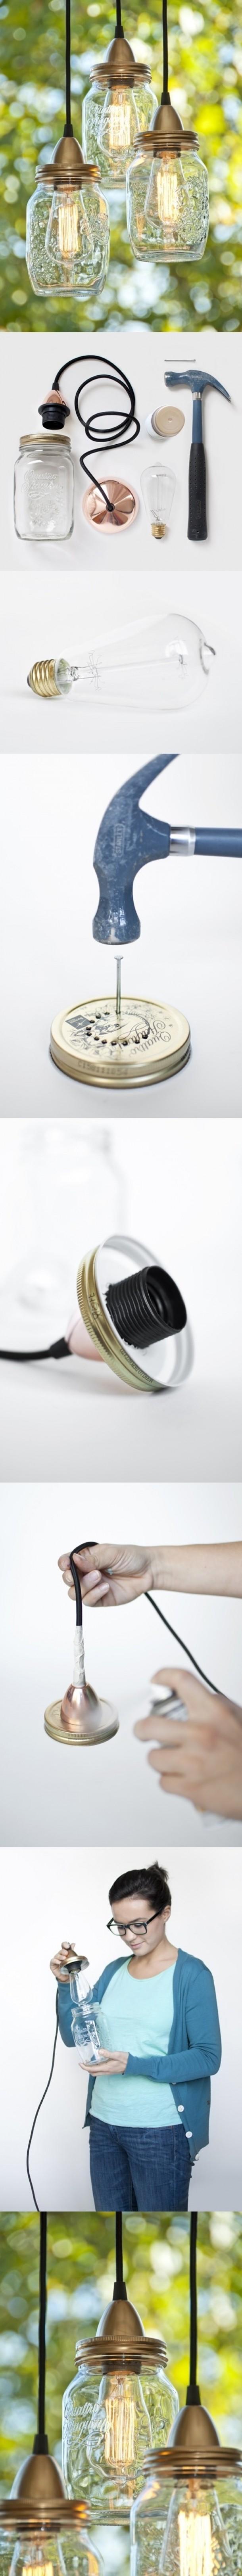 Leuke lampen maken!